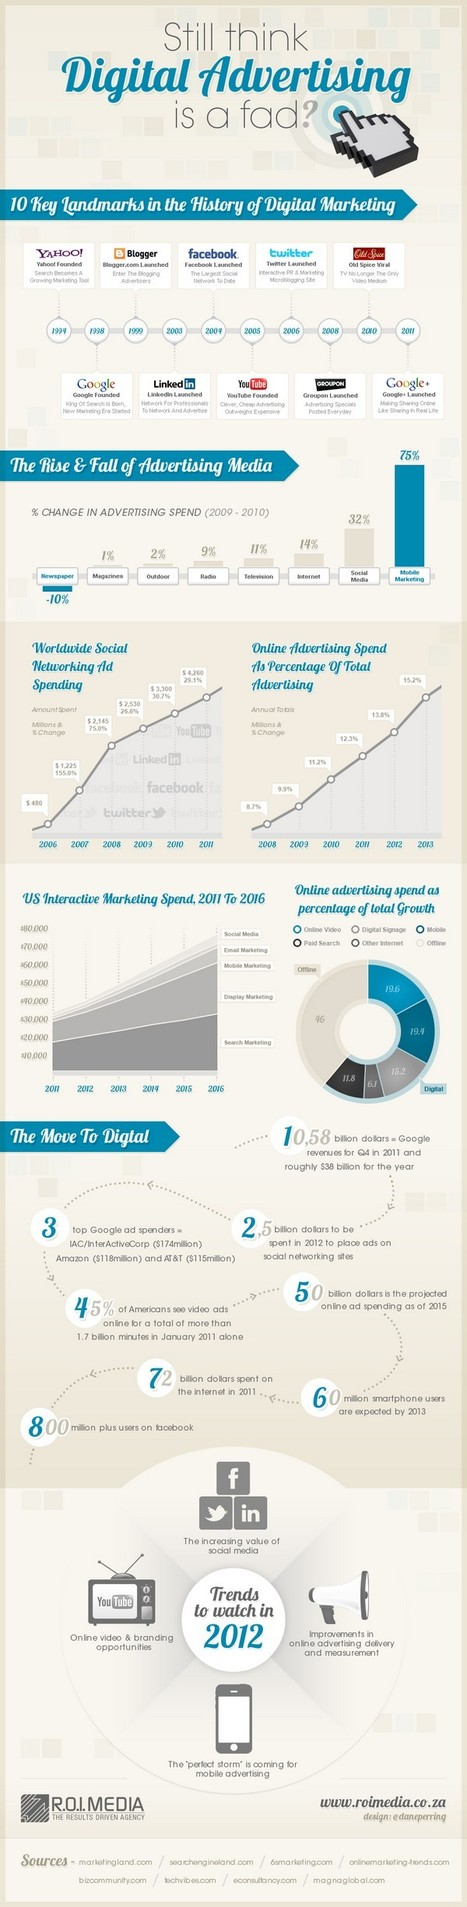 Still think Digital Advertising is a Fad? [Infographic] | New Digital Media | Scoop.it